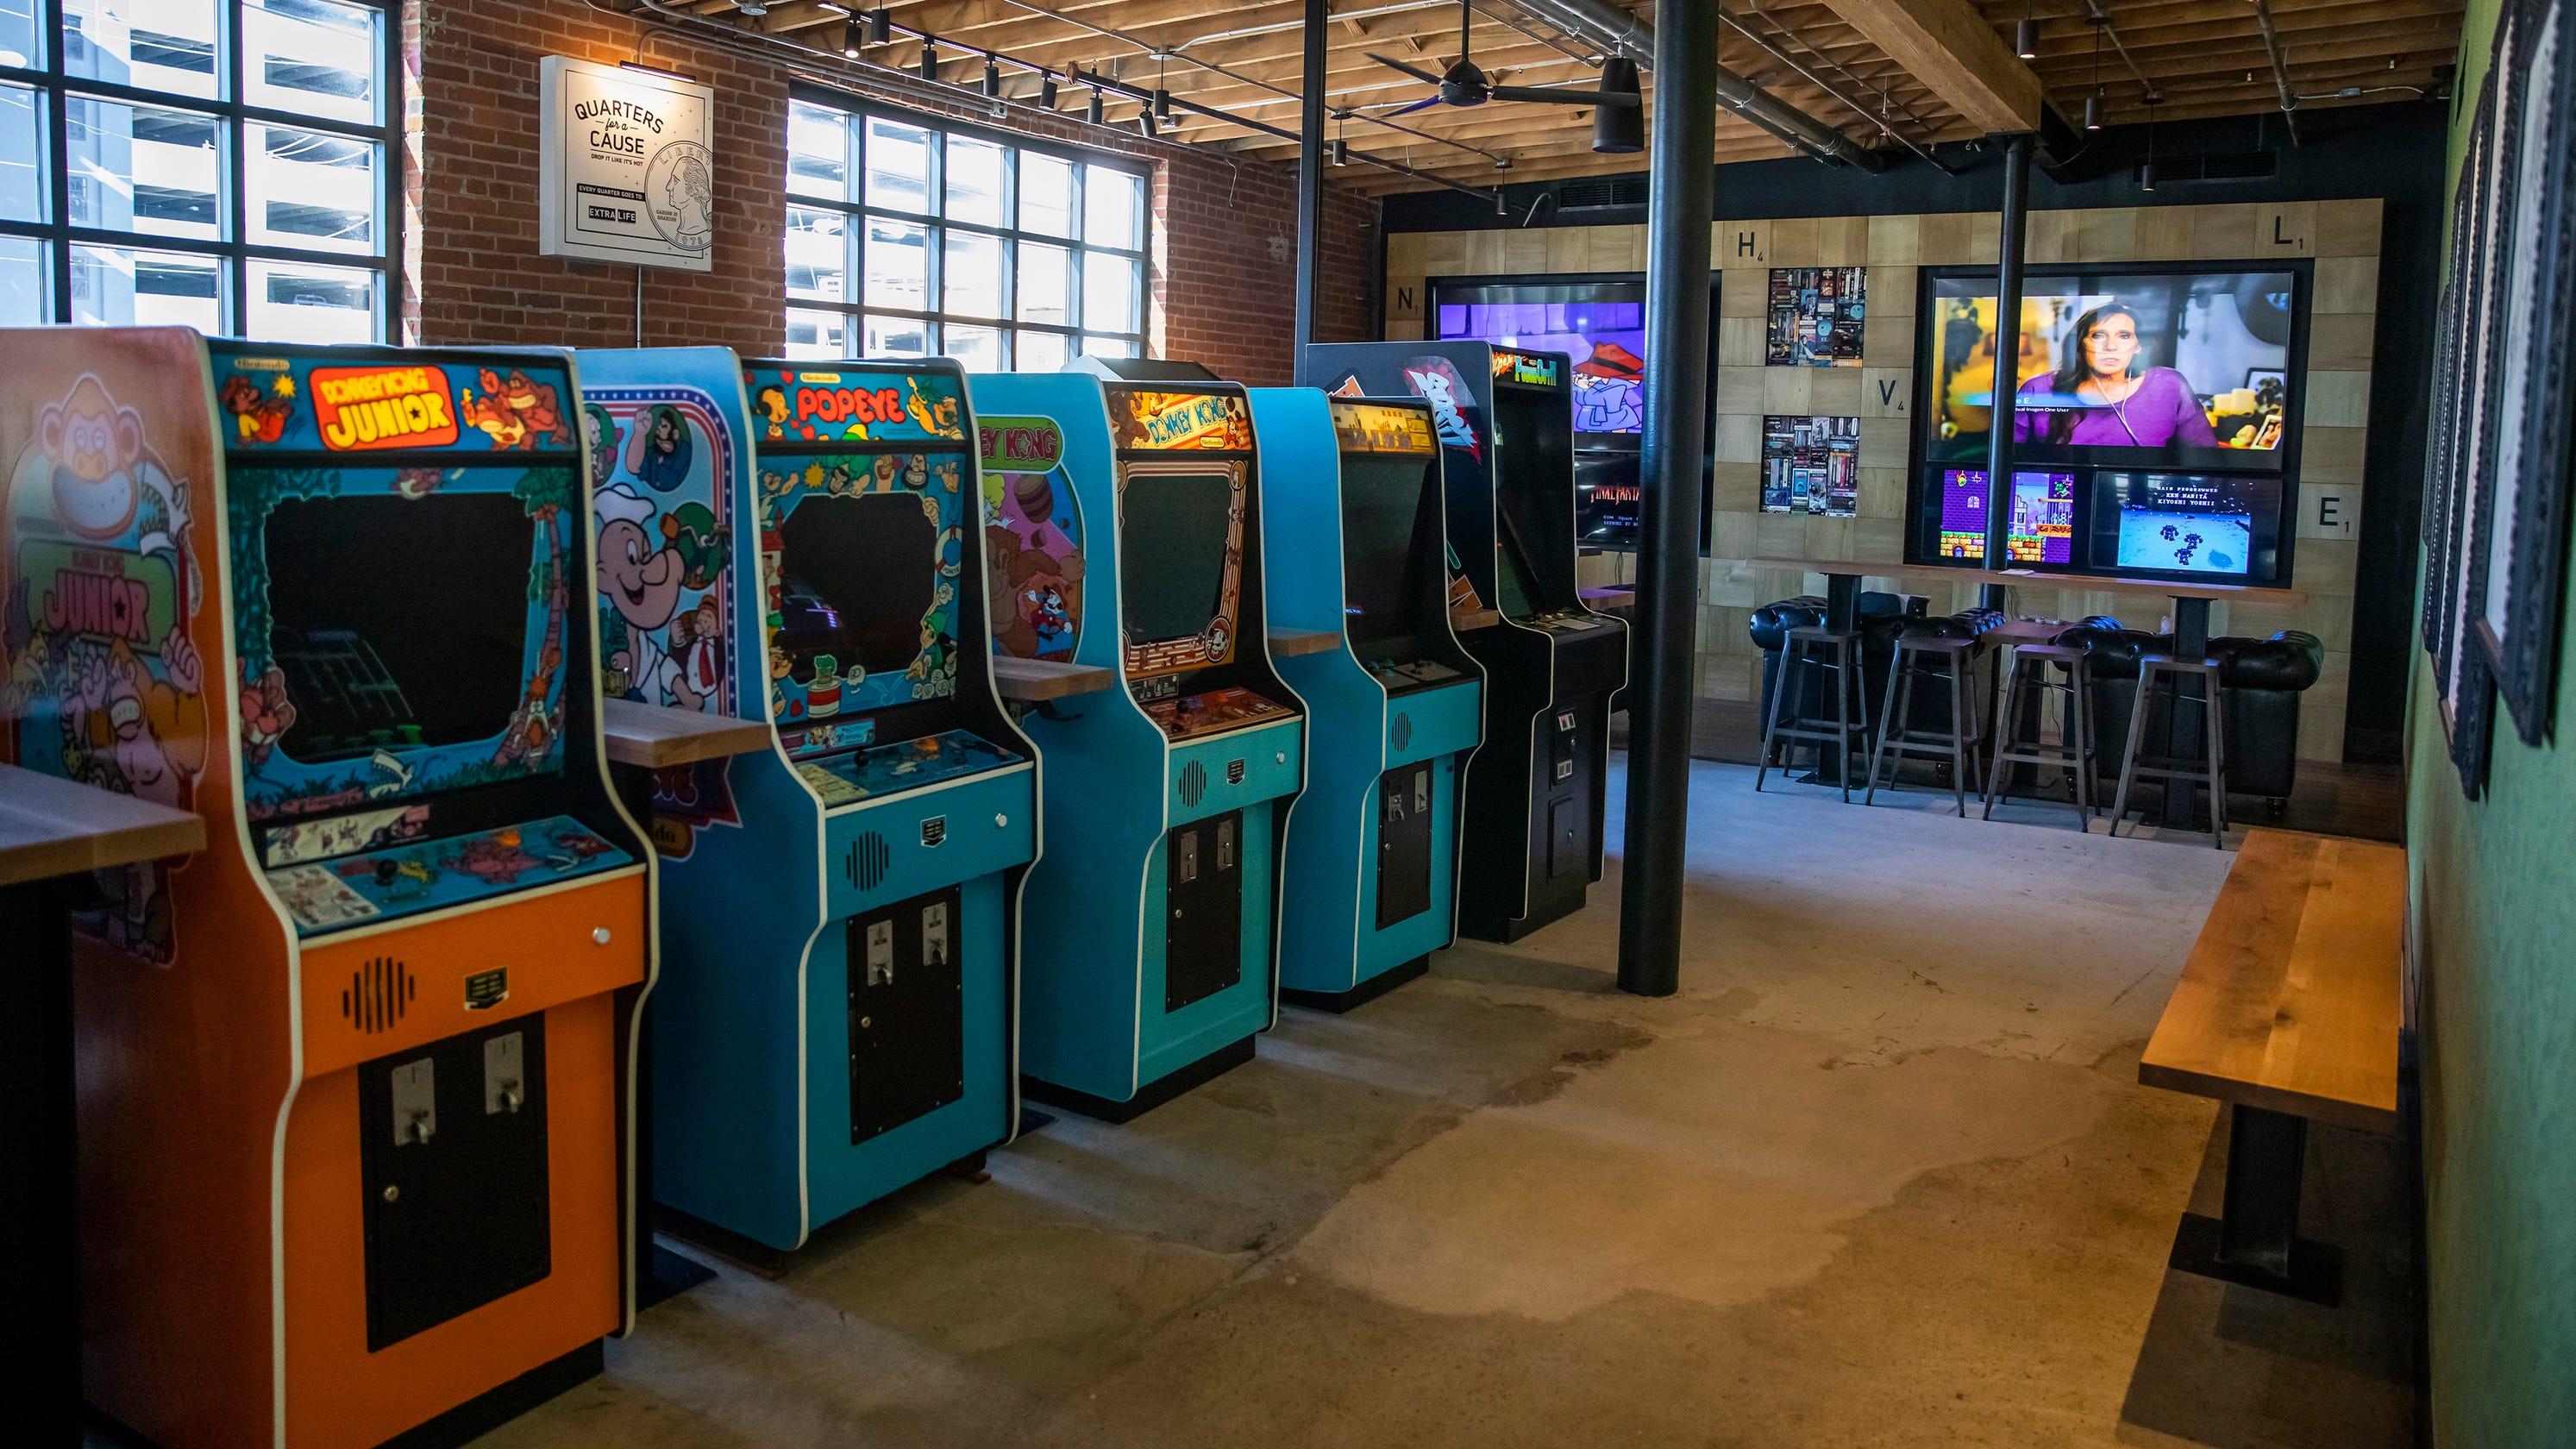 16-Bit, Pins Mechanical in Nashville bring arcade, bowling to Gulch